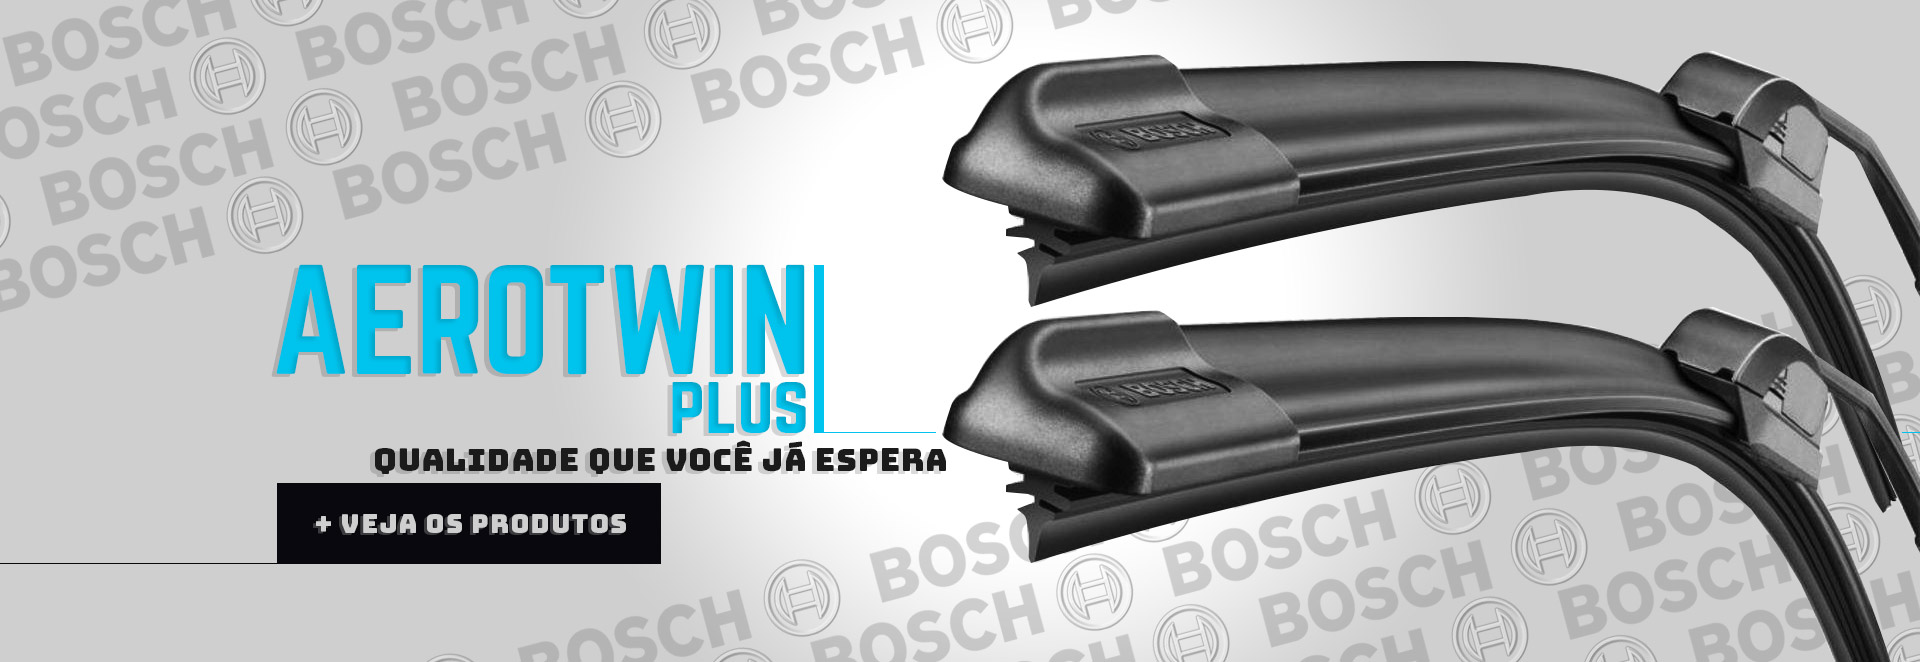 Aerotwin Plus Bosch